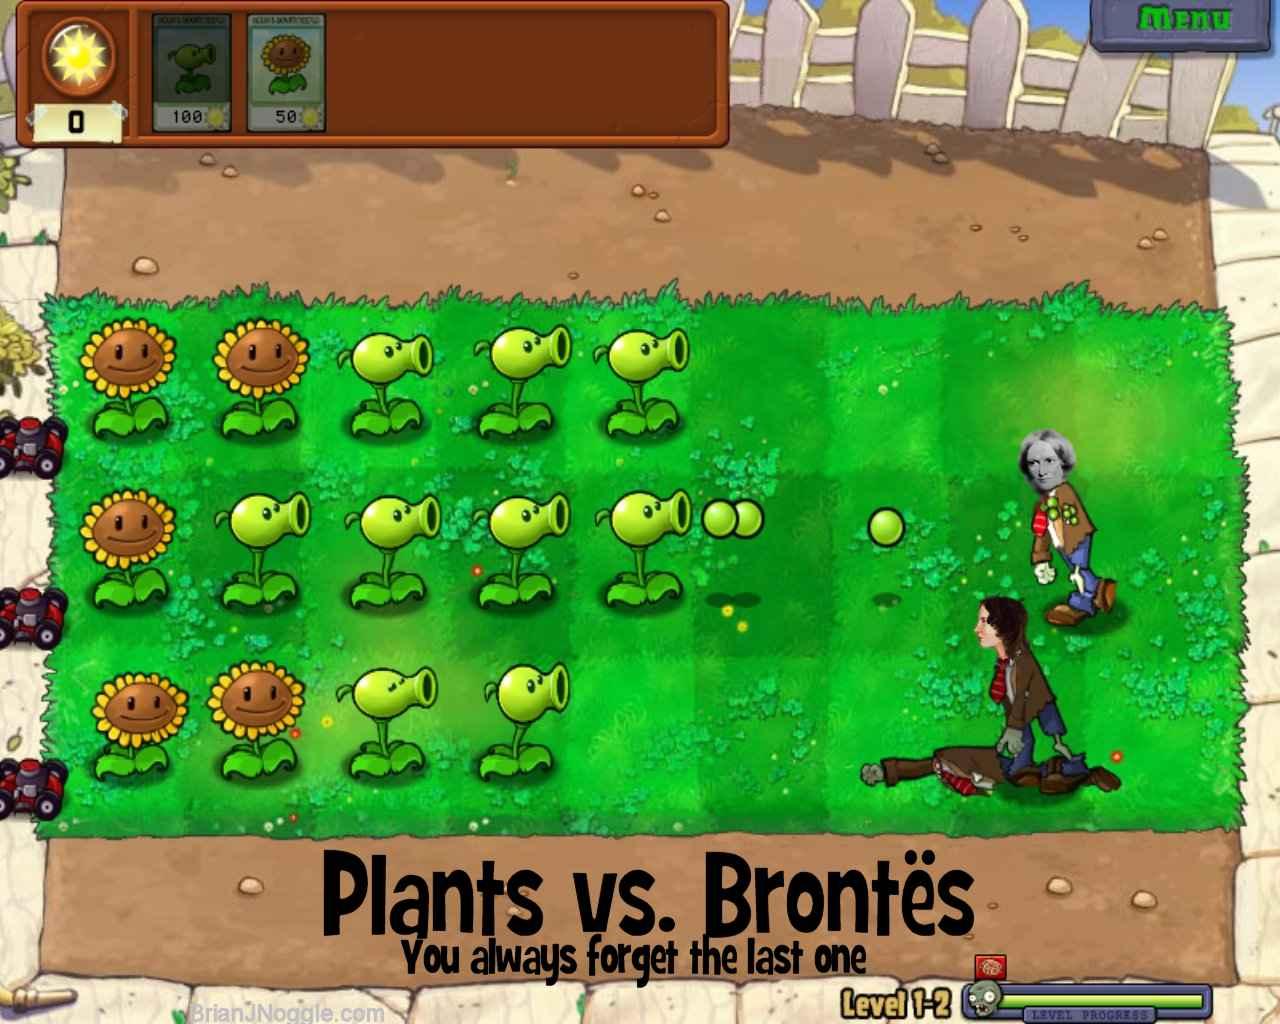 Plants vs Brontës